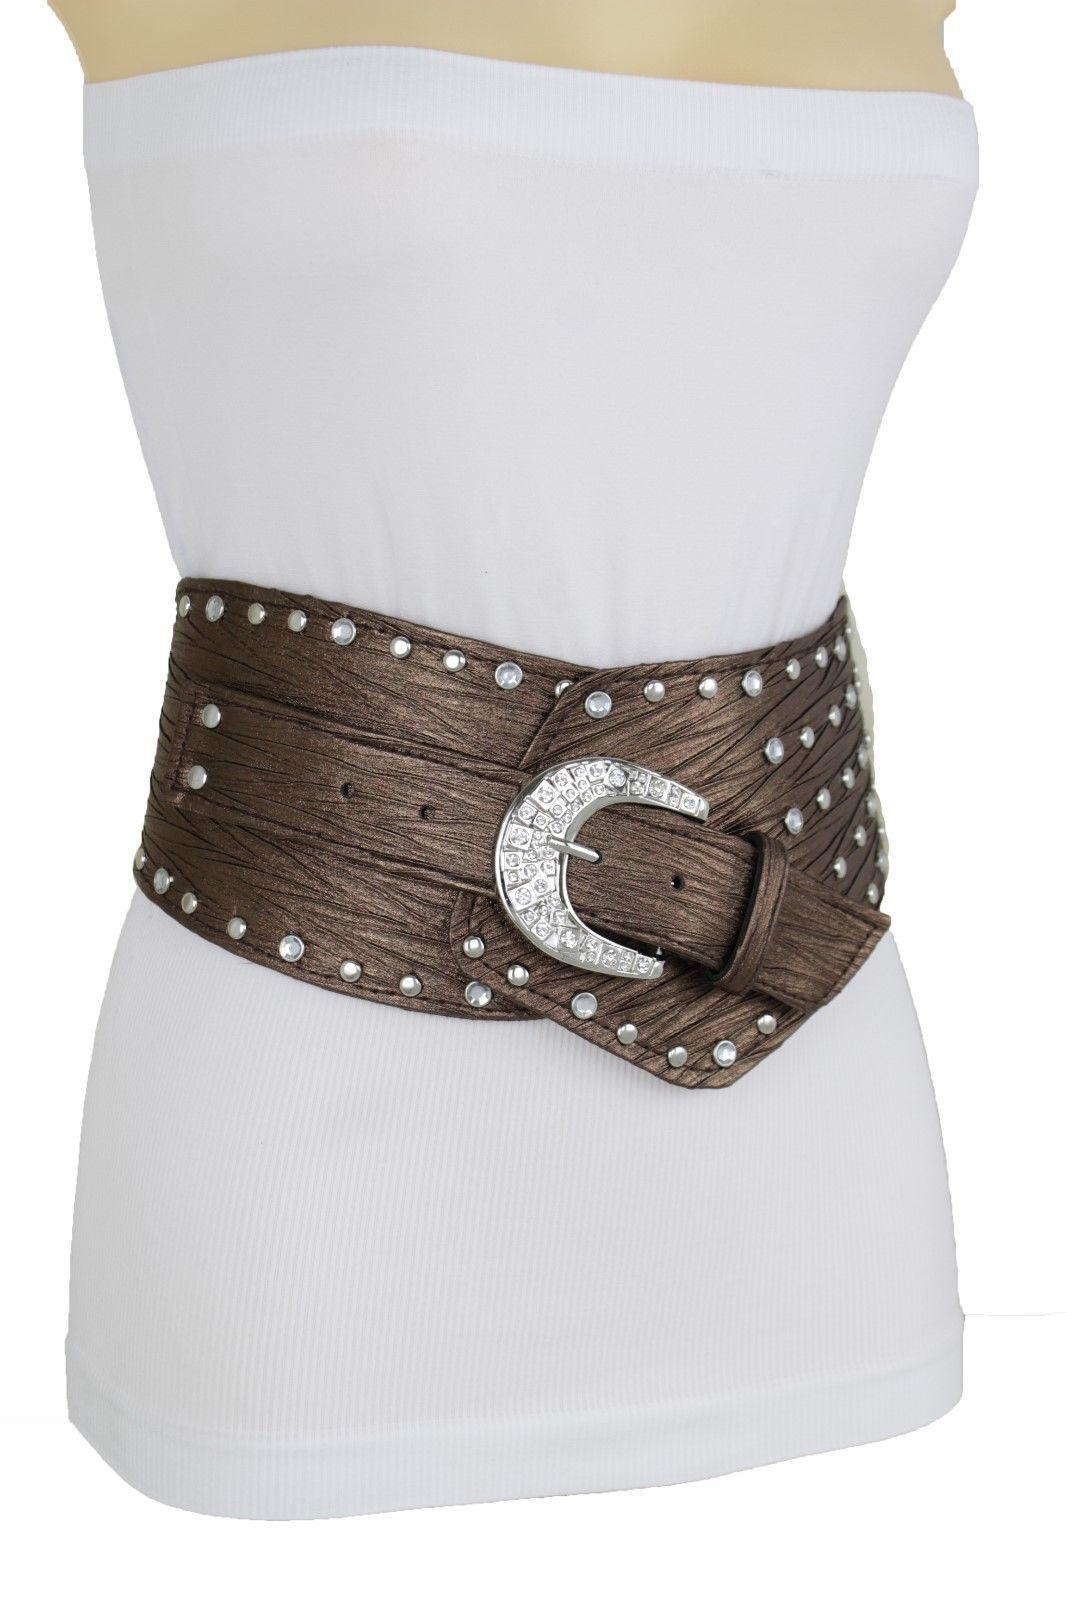 Sexy Damen Metallisch Braun West Gürtel Hüfte Taille Silber Bling Anhänger